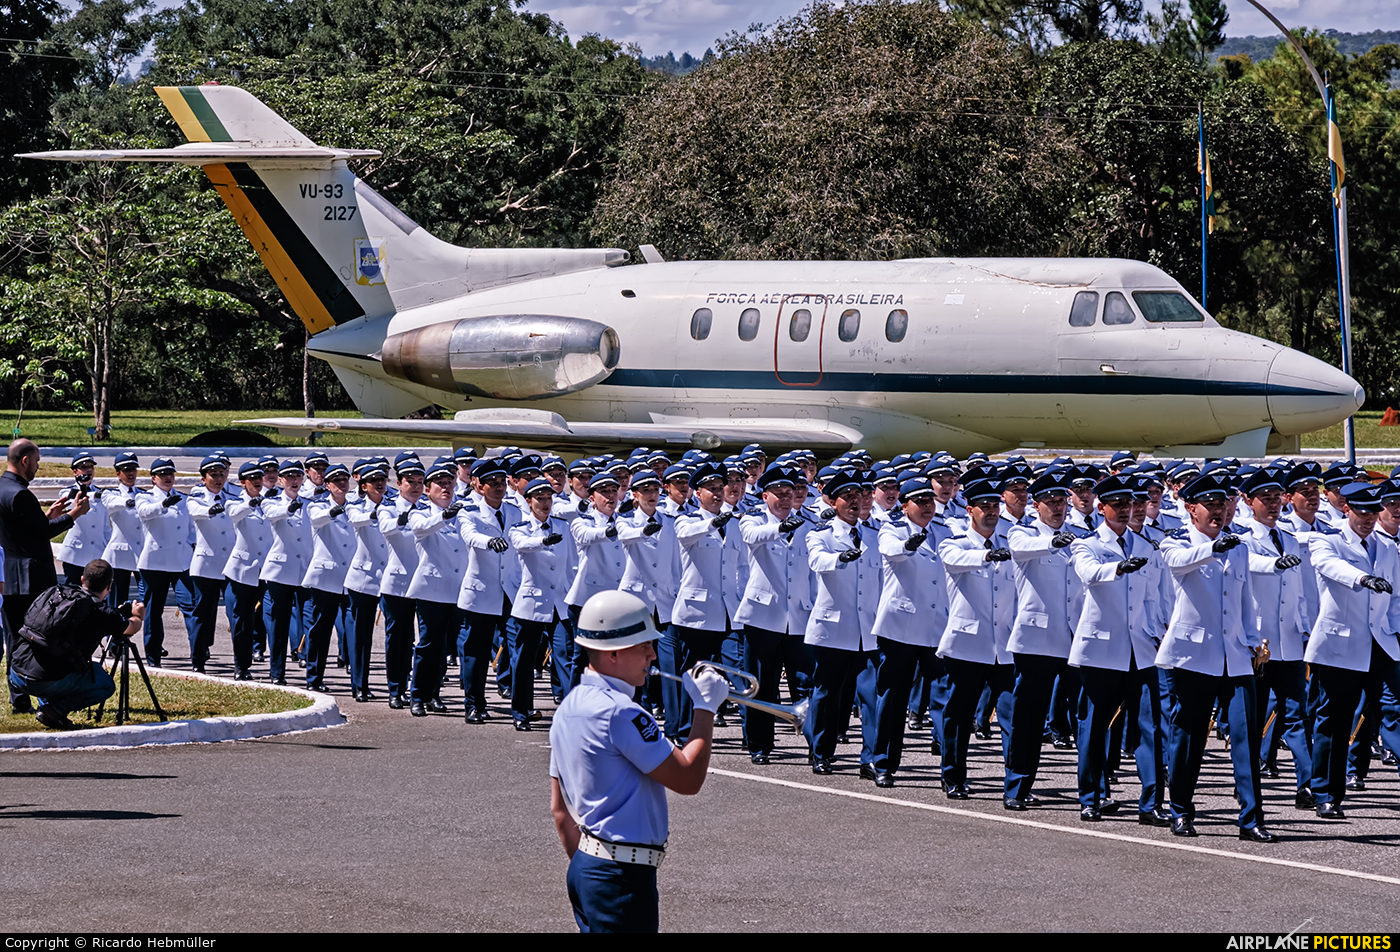 Brazil - Air Force 2127 aircraft at Brasília - Presidente Juscelino Kubitschek Intl